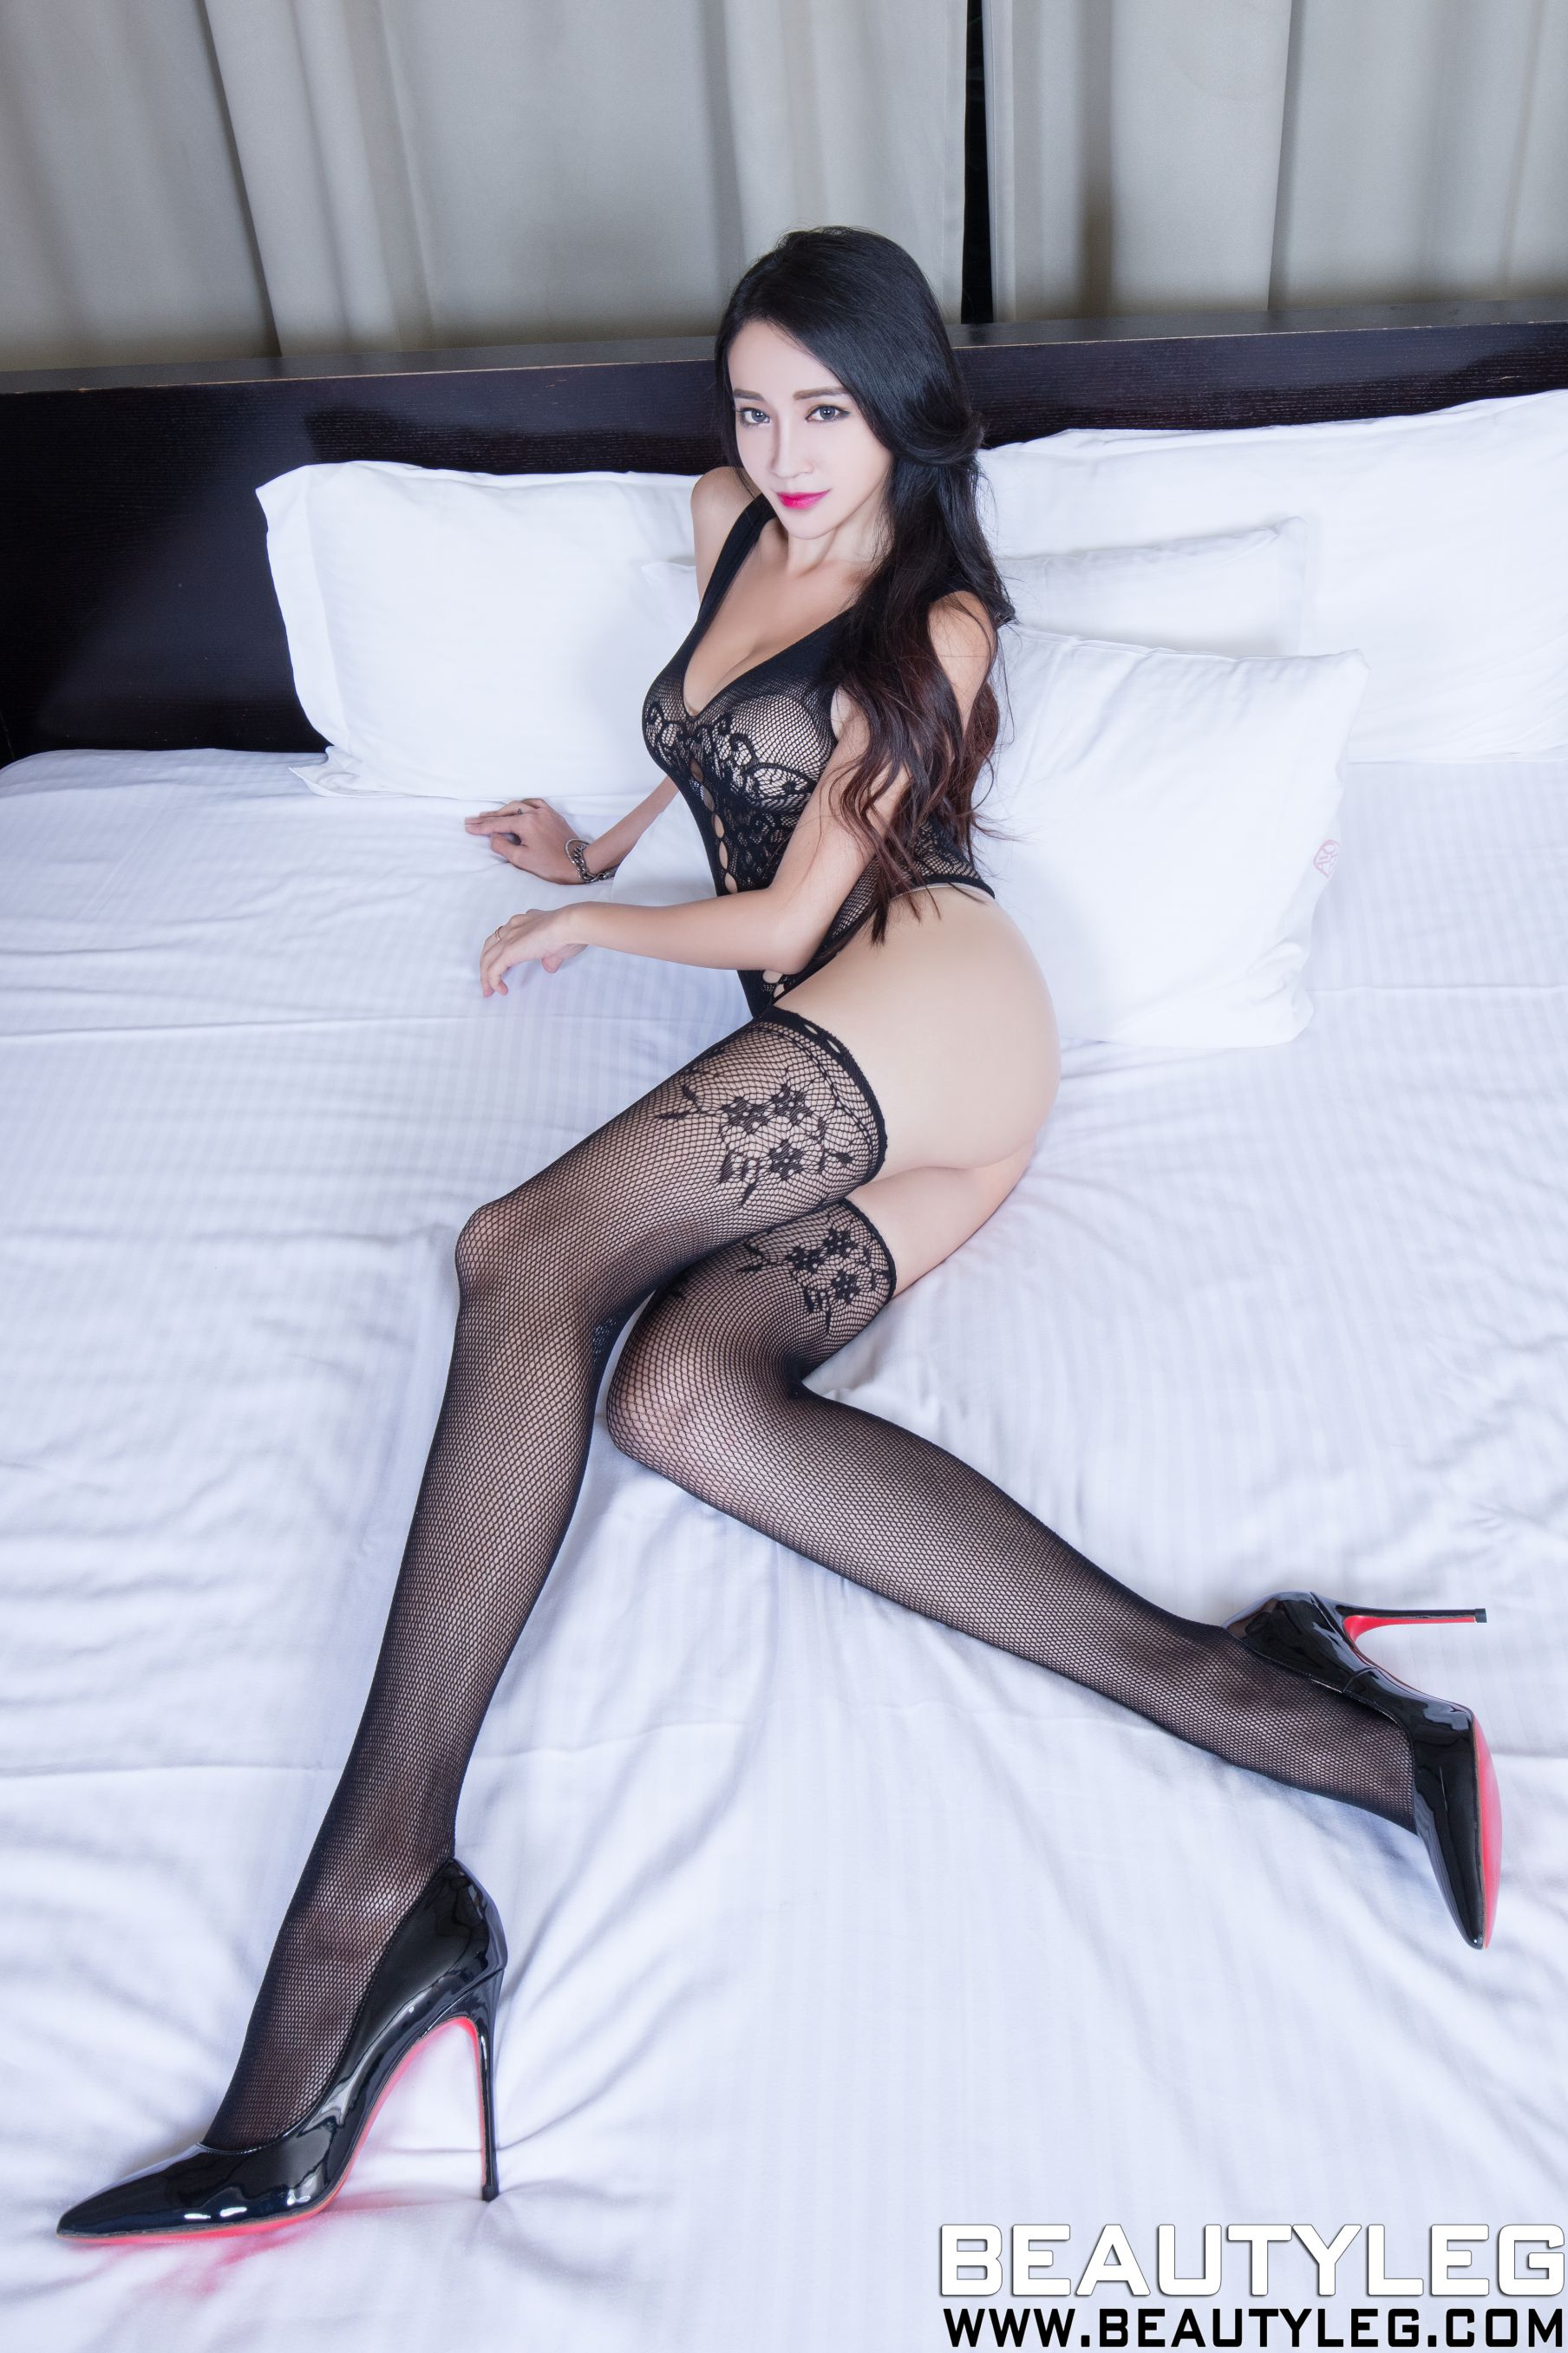 VOL.1585 [Beautyleg]丝袜美腿情趣丝袜:詹艾葳(腿模Avril,腿模Arvil)高品质写真套图(54P)